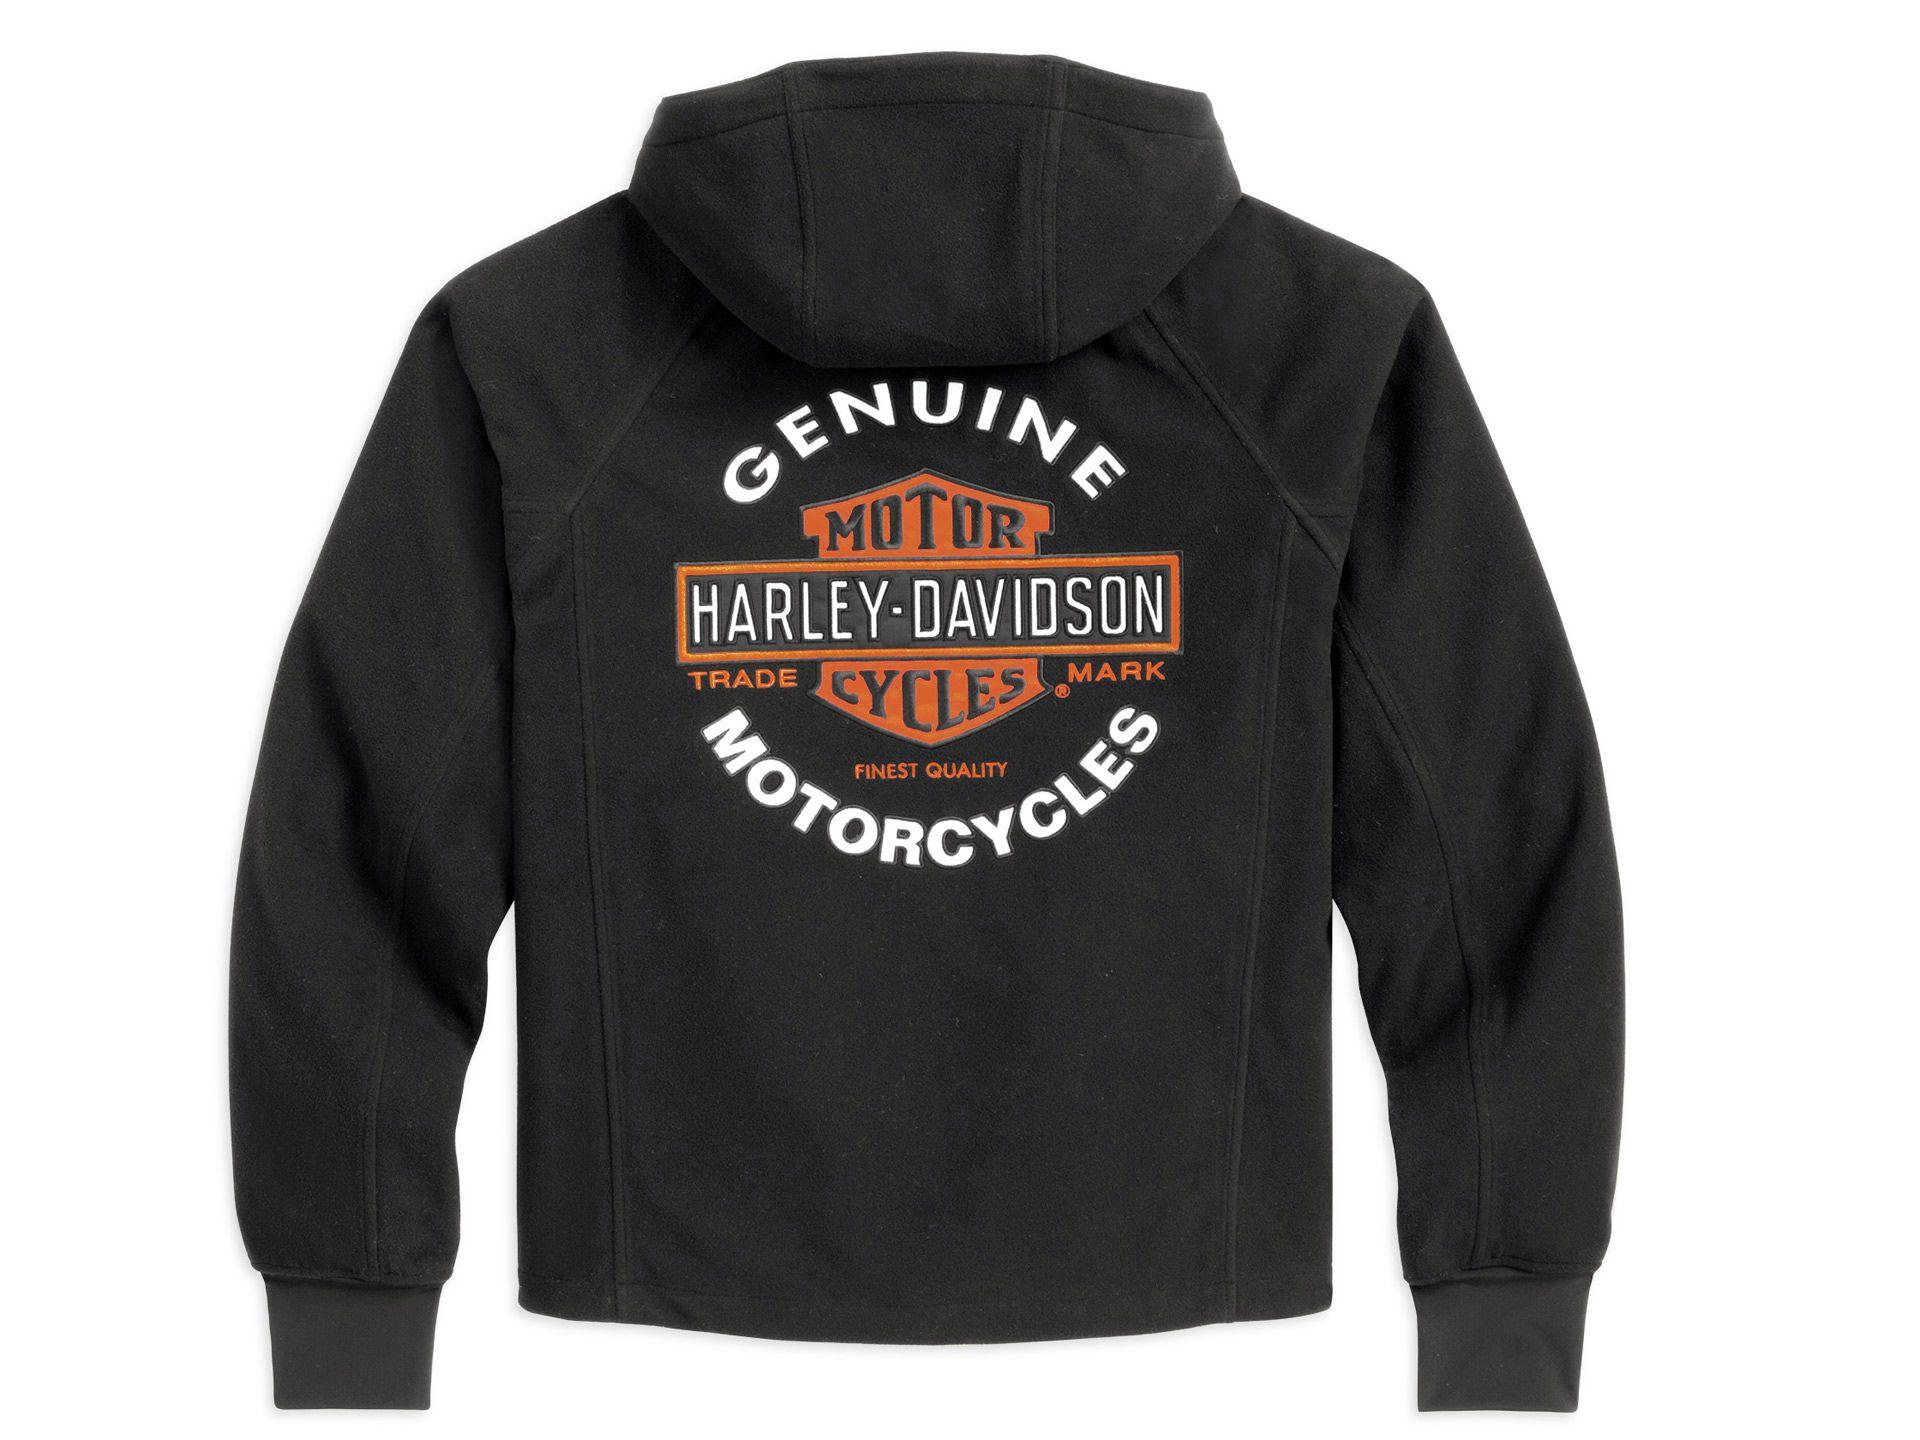 Harley Davidson Herren Jacke